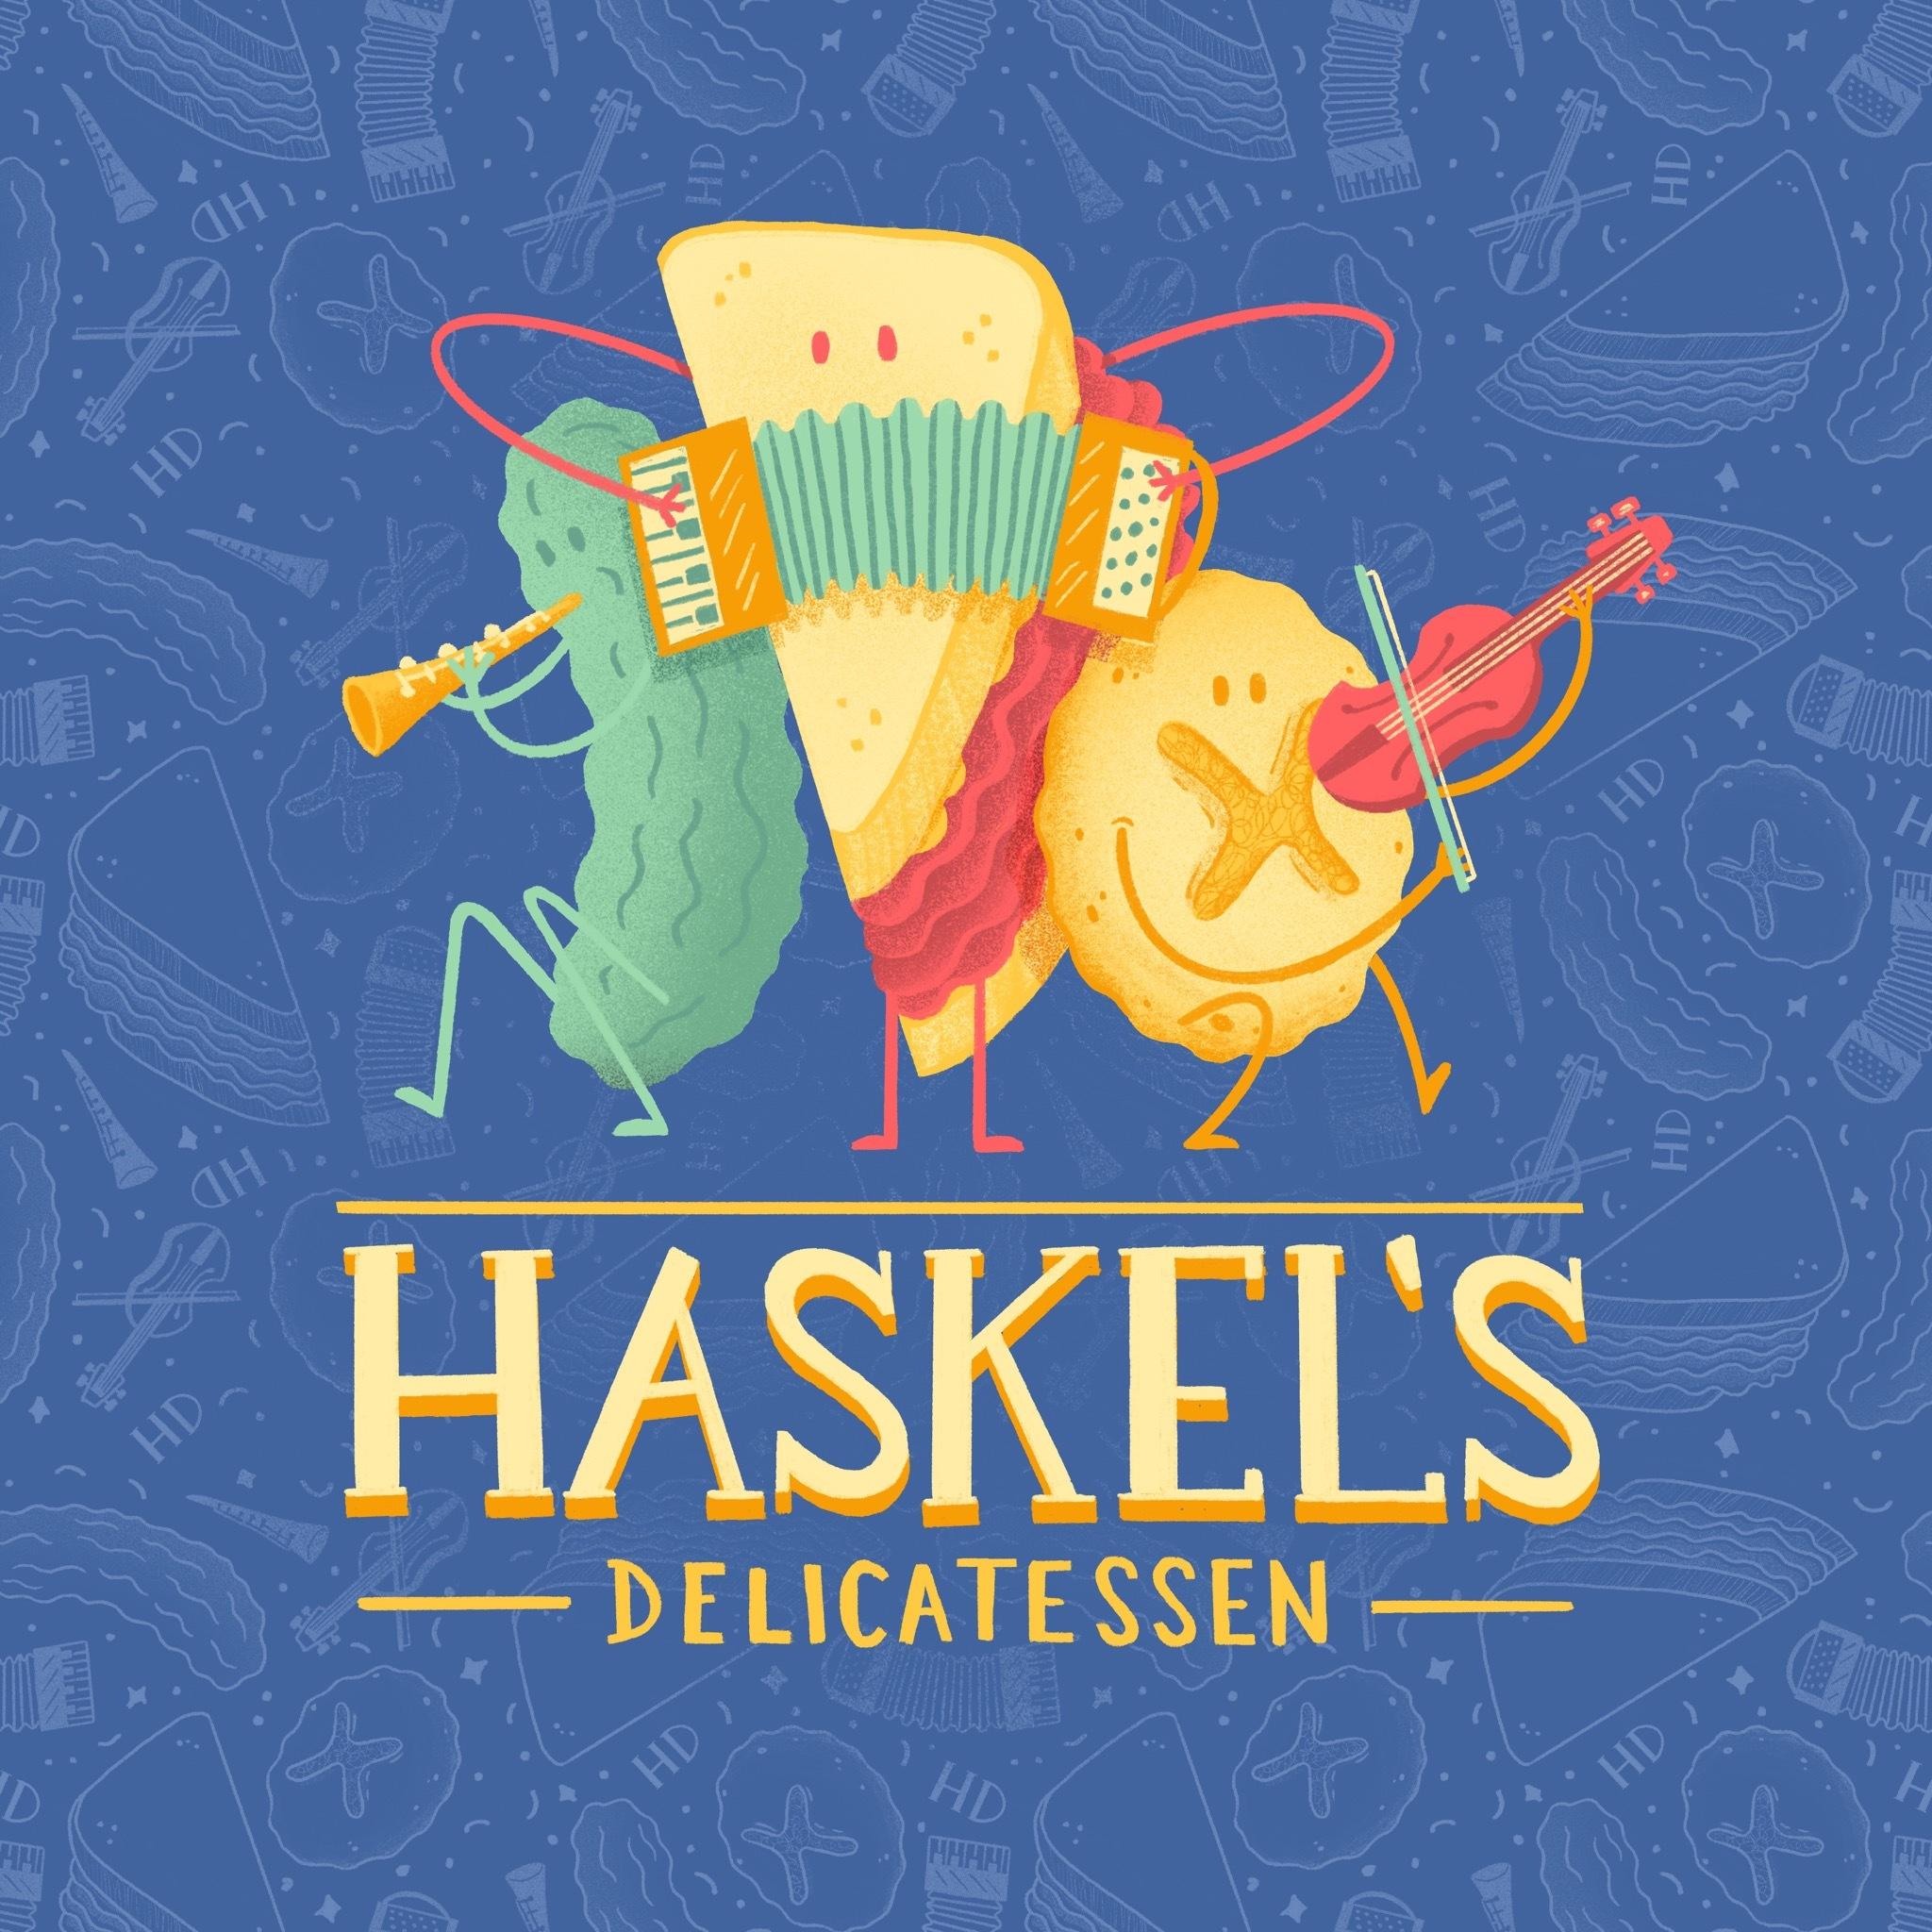 Haskels Delicatessen food truck profile image